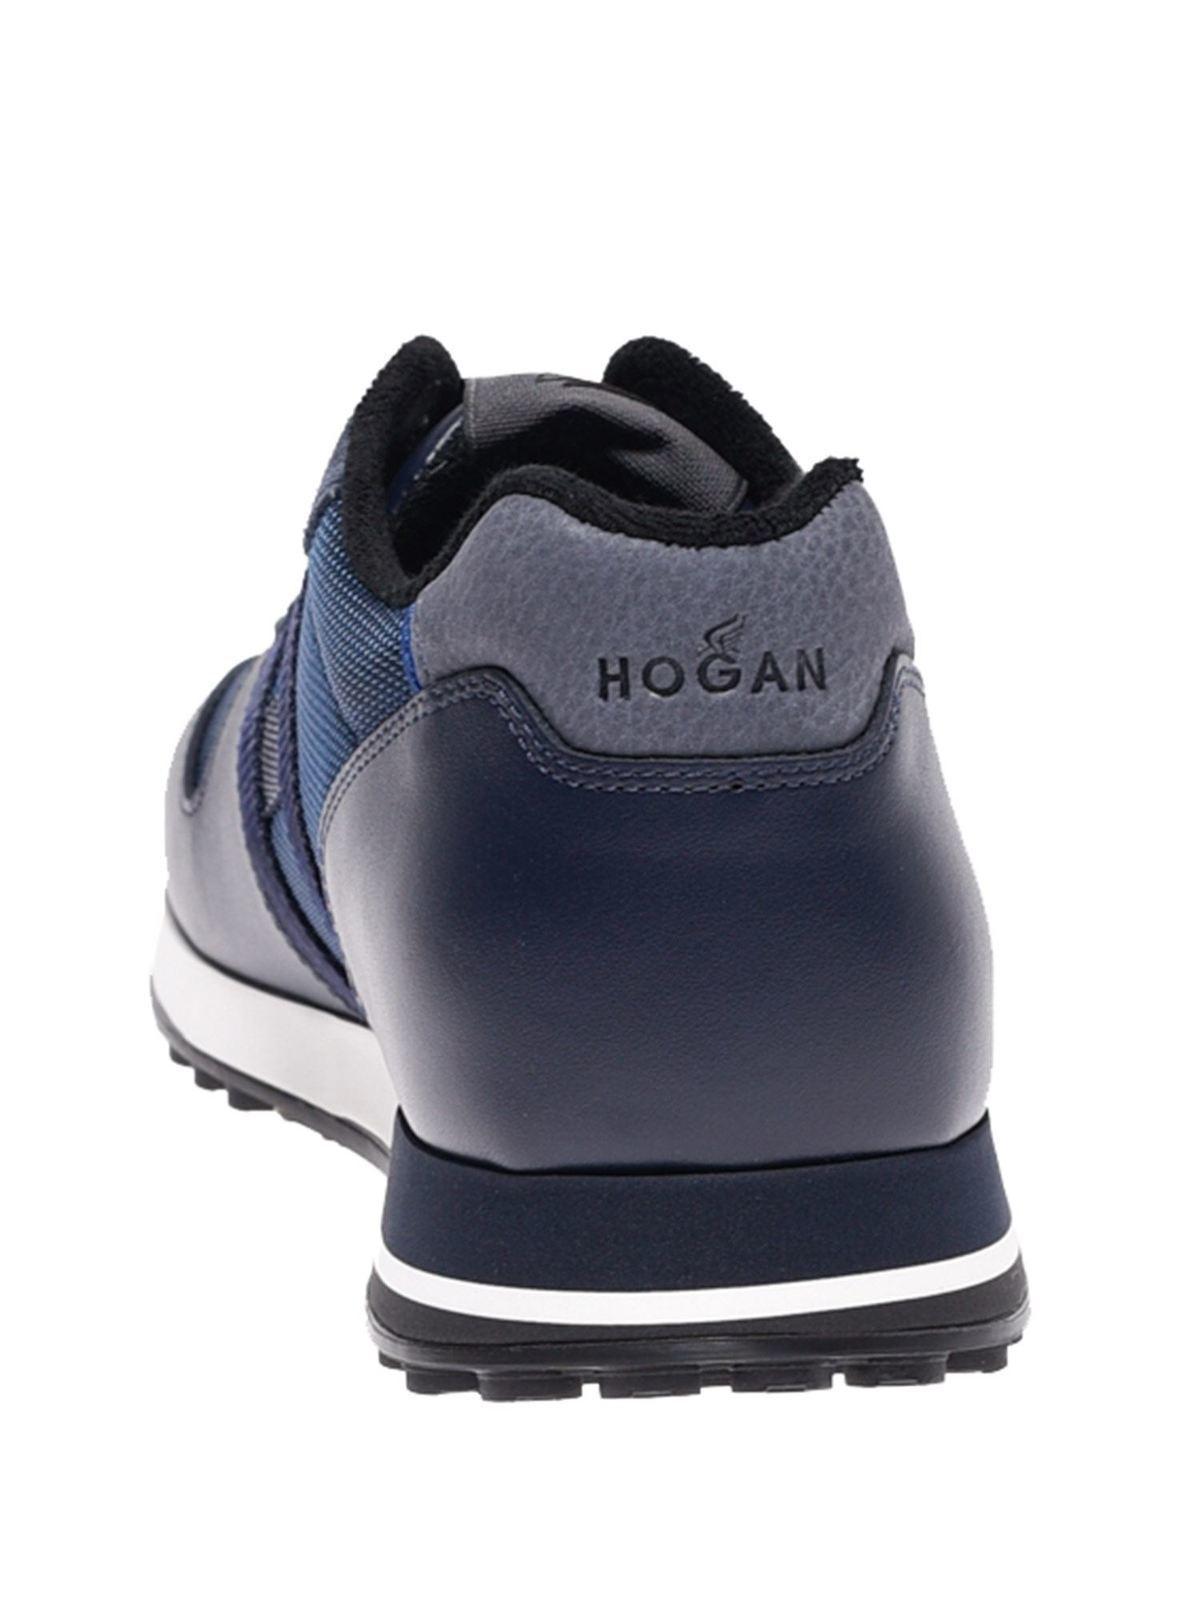 Sneakers Hogan - Sneakers H383 blu - HXM3830AN51PGN617V